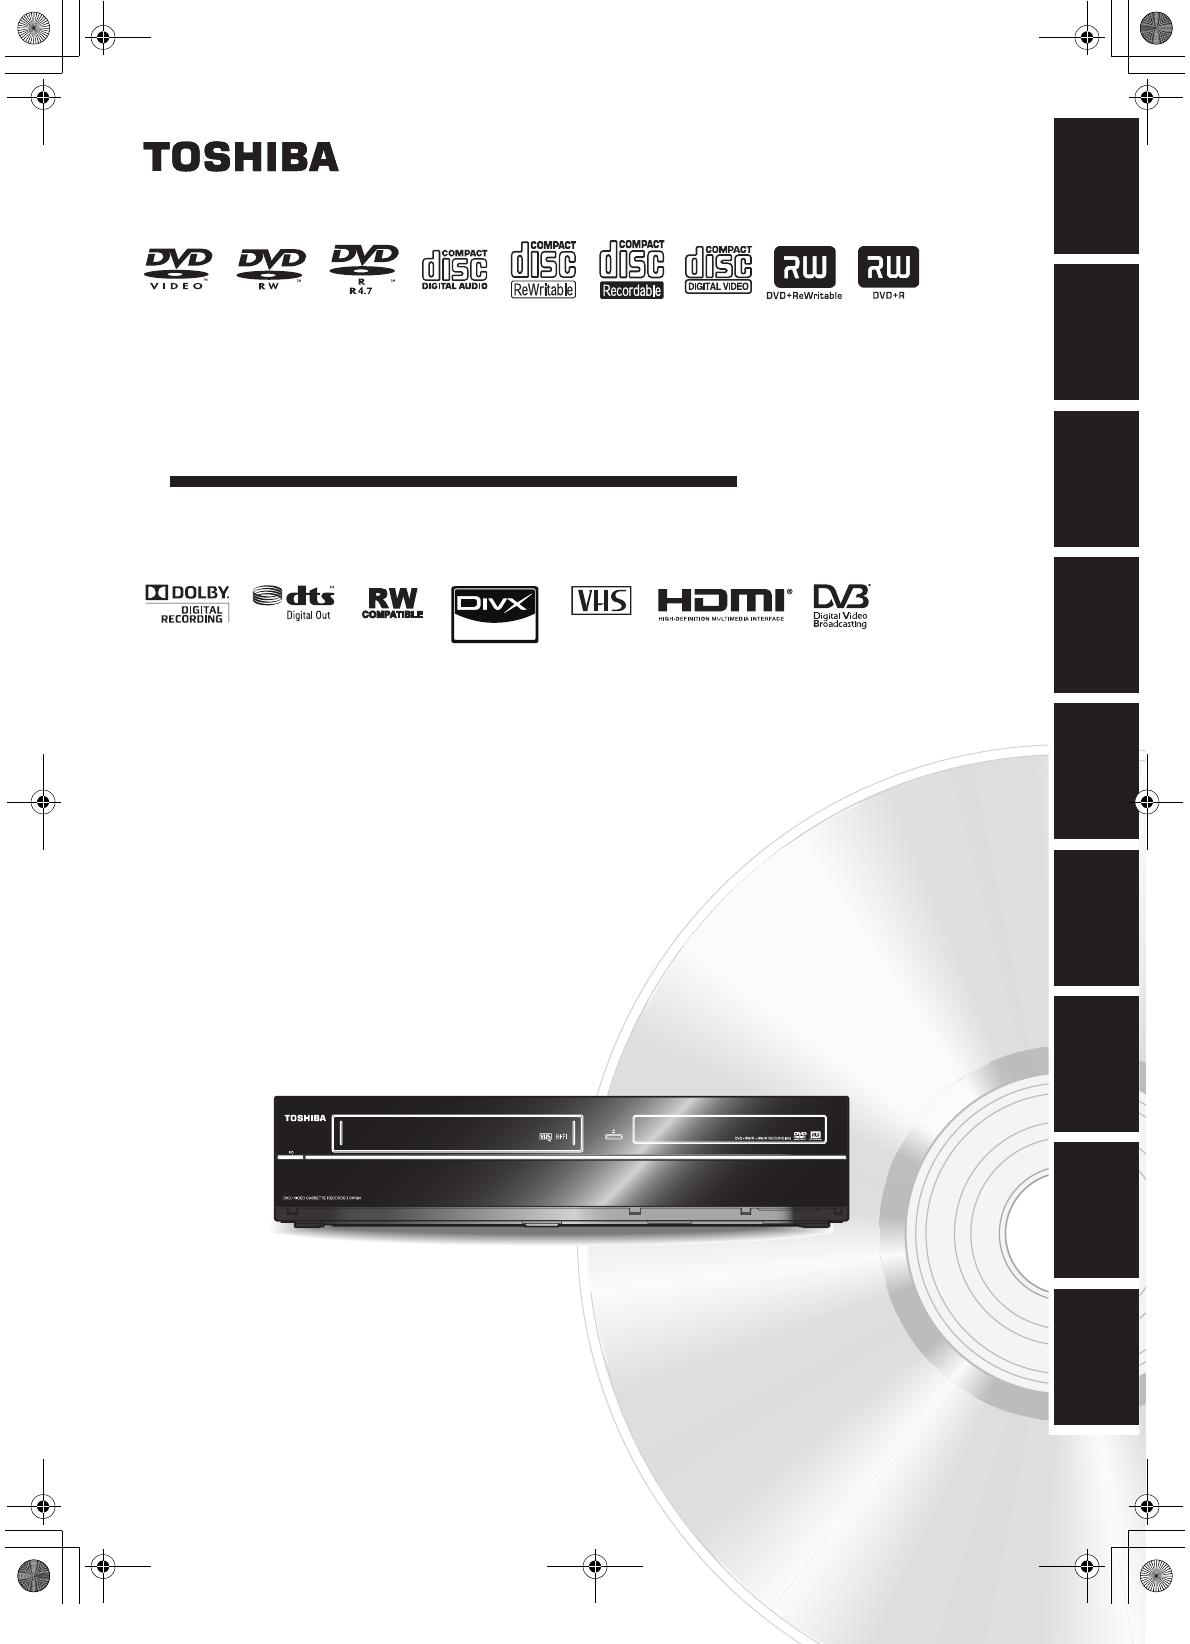 Toshiba Dvr20 Users Manual